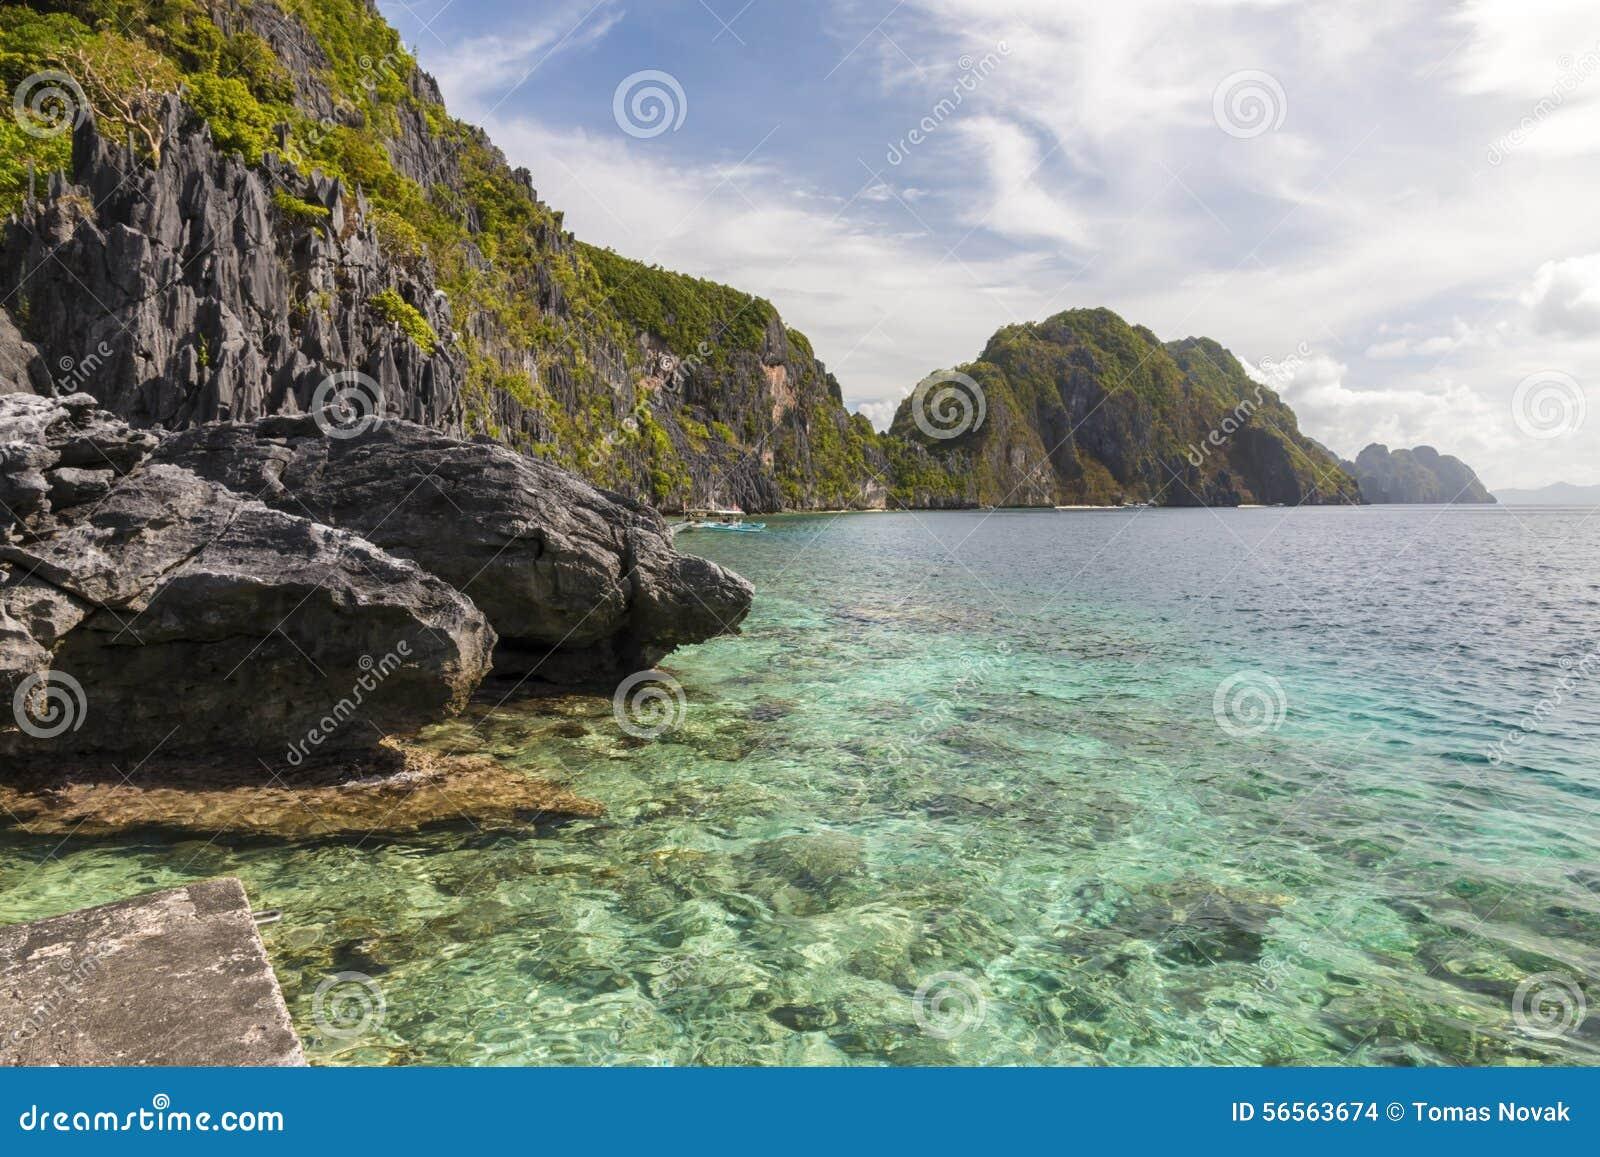 Download Πράσινοι λόφοι και βράχοι που αυξάνονται από τη θάλασσα Στοκ Εικόνες - εικόνα από ζυγοστάτης, παράδεισος: 56563674